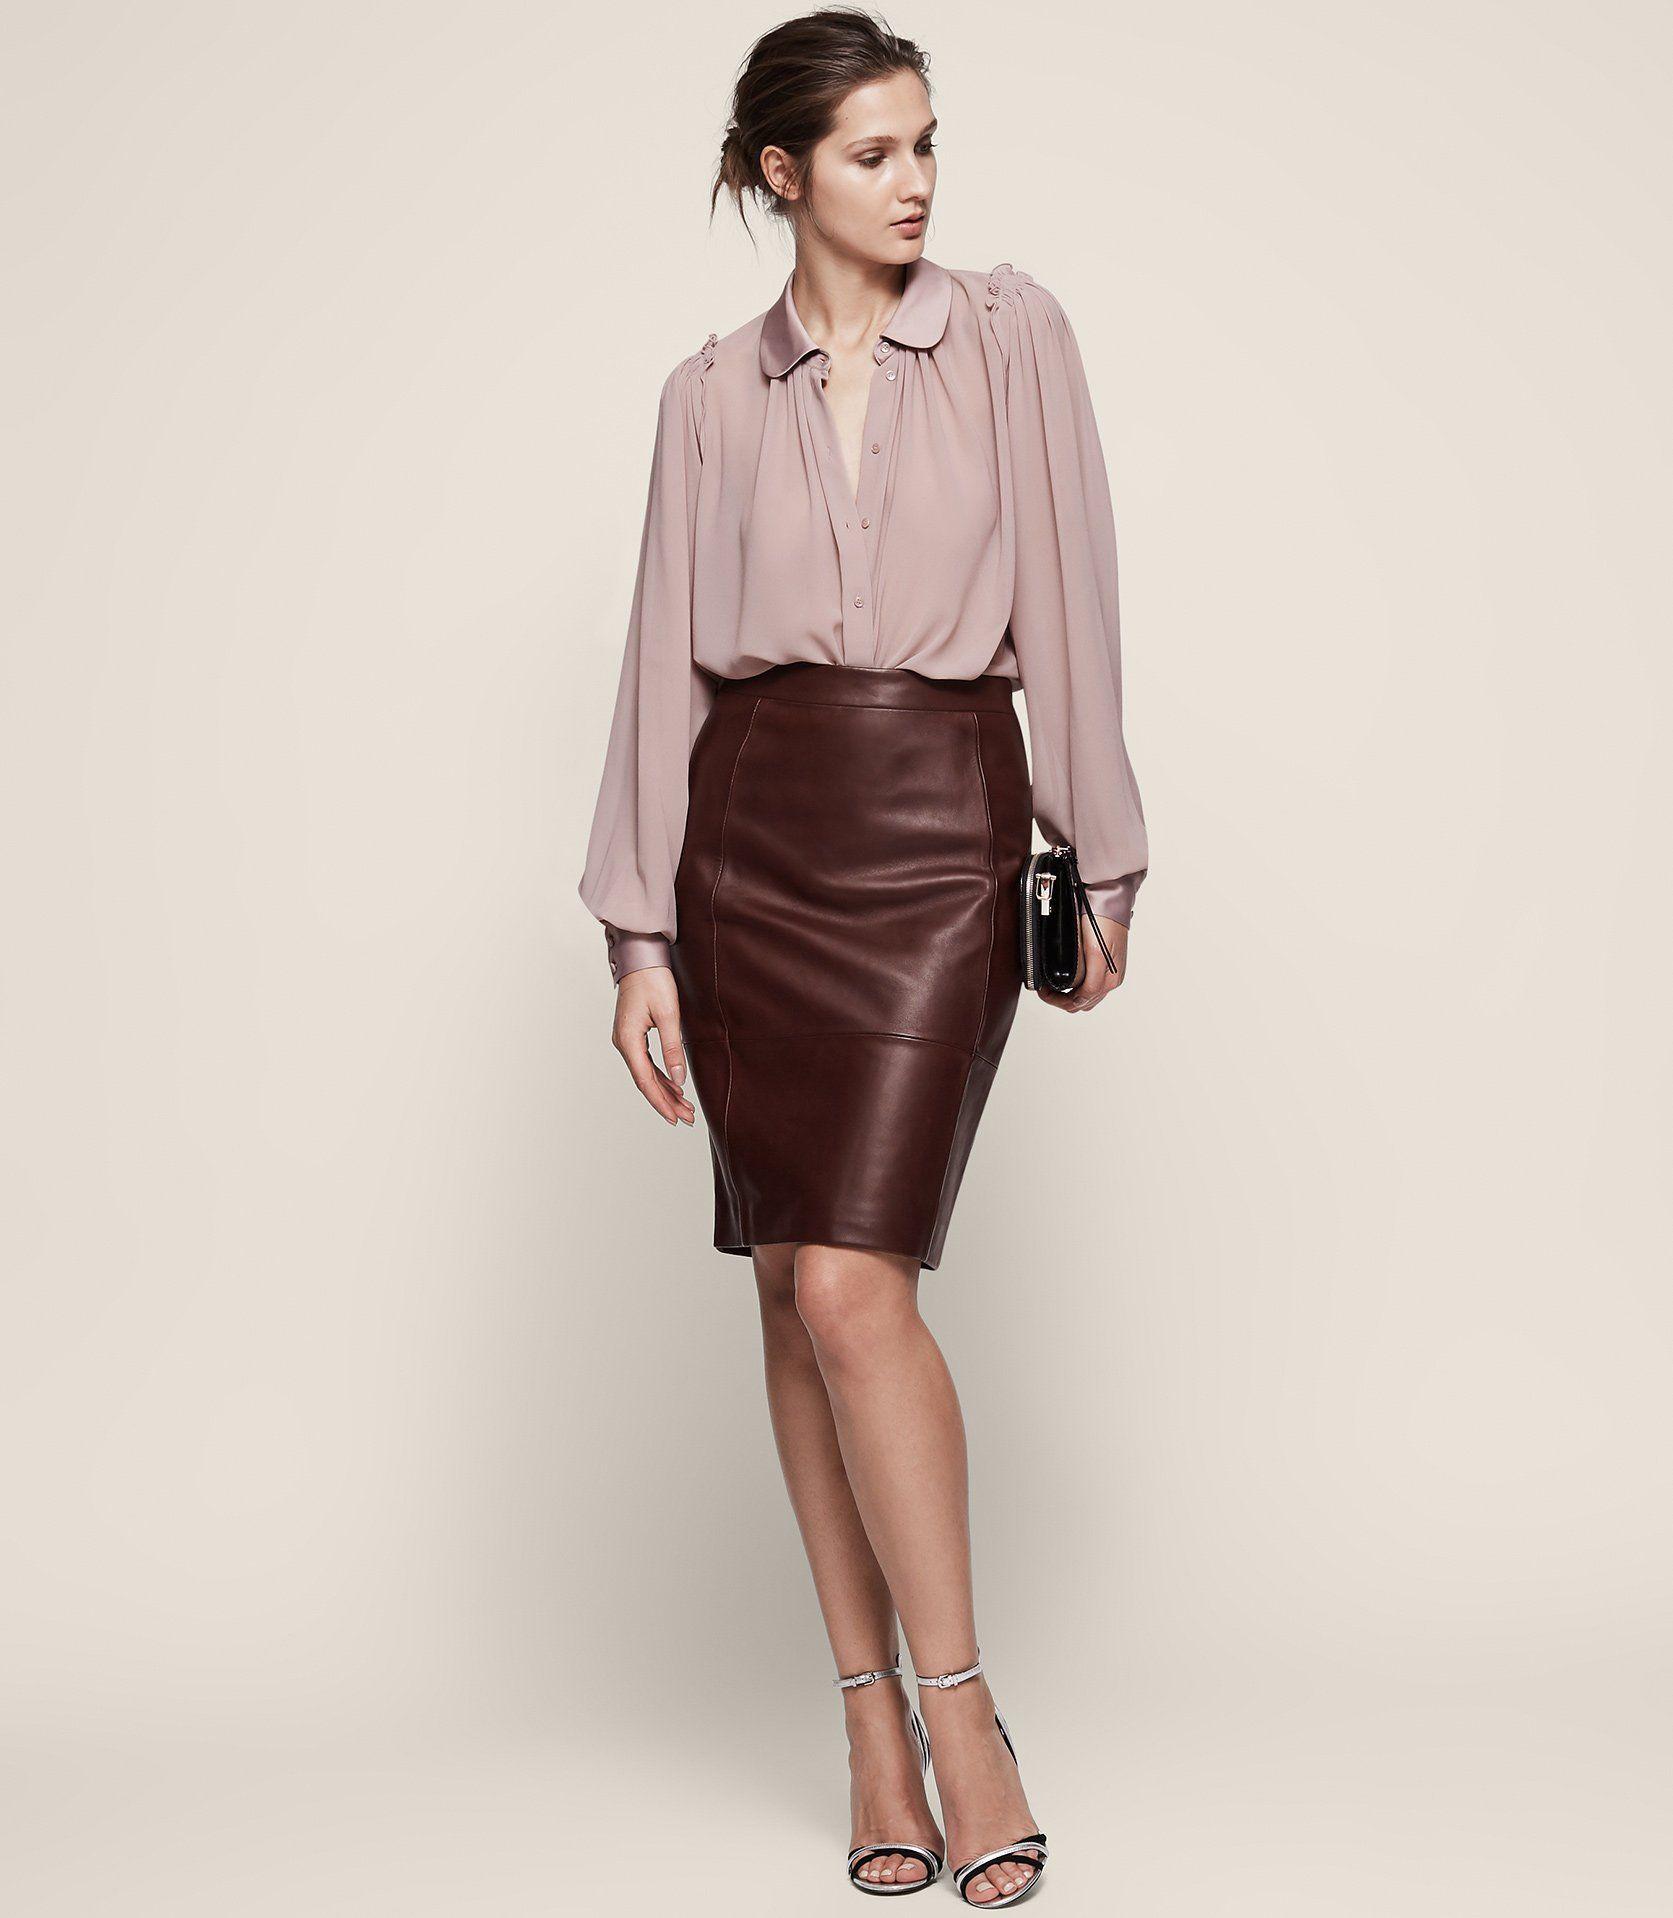 373c862e78 Olivia Stretch Panel Leather Skirt - REISS